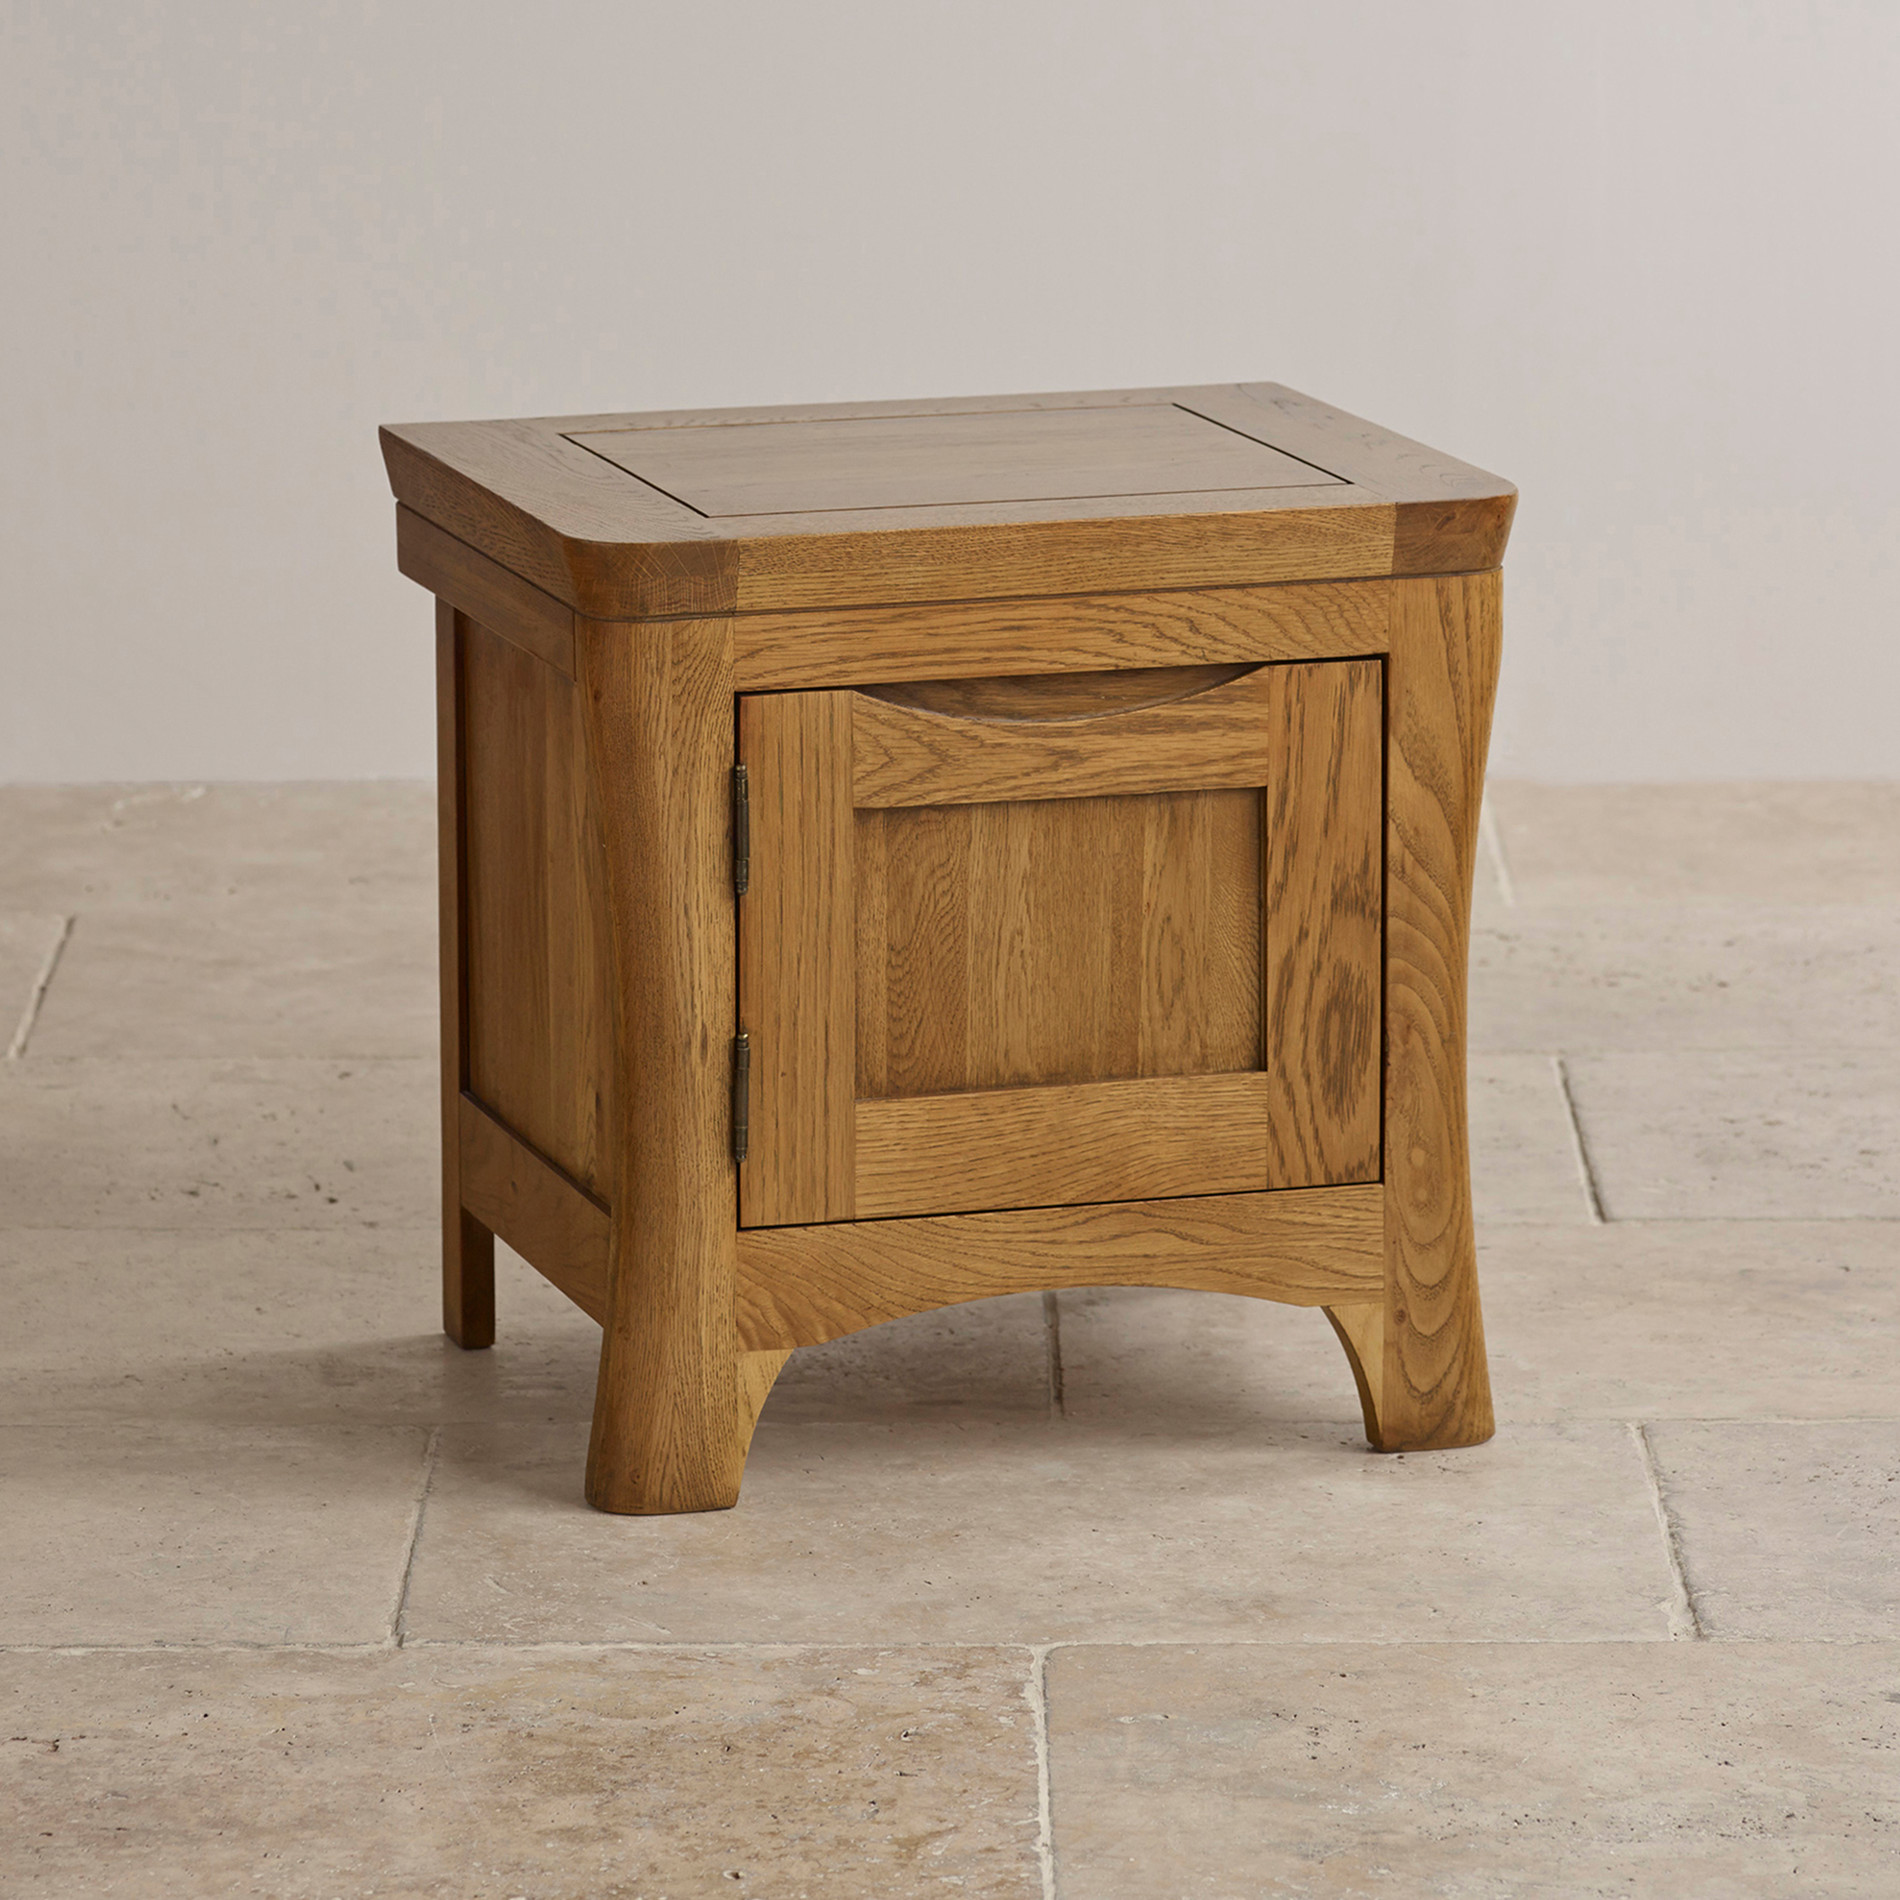 Orrick 1 door bedside cabinet rustic solid oak for Oak bedroom furniture 0 finance